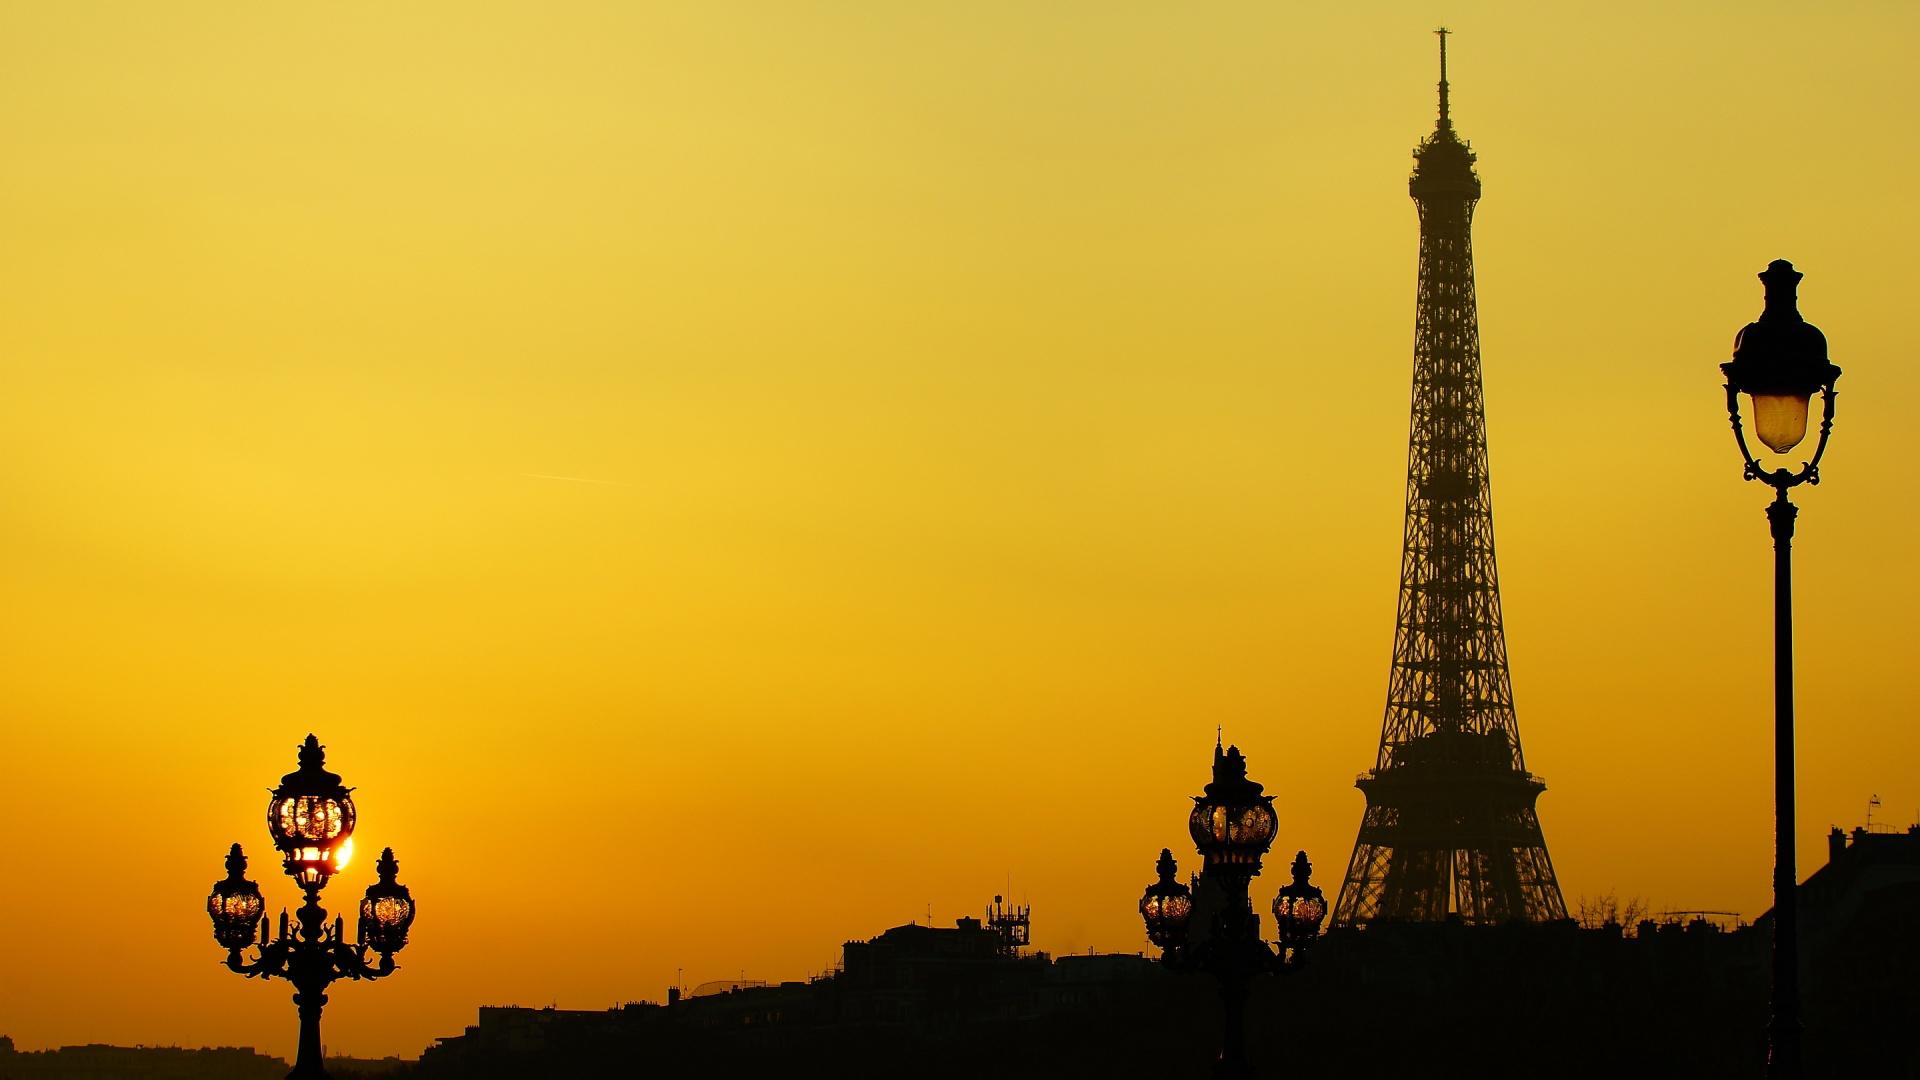 Eiffel Tower Tumblr HD Desktop Wallpaper HD Desktop Wallpaper 1920x1080